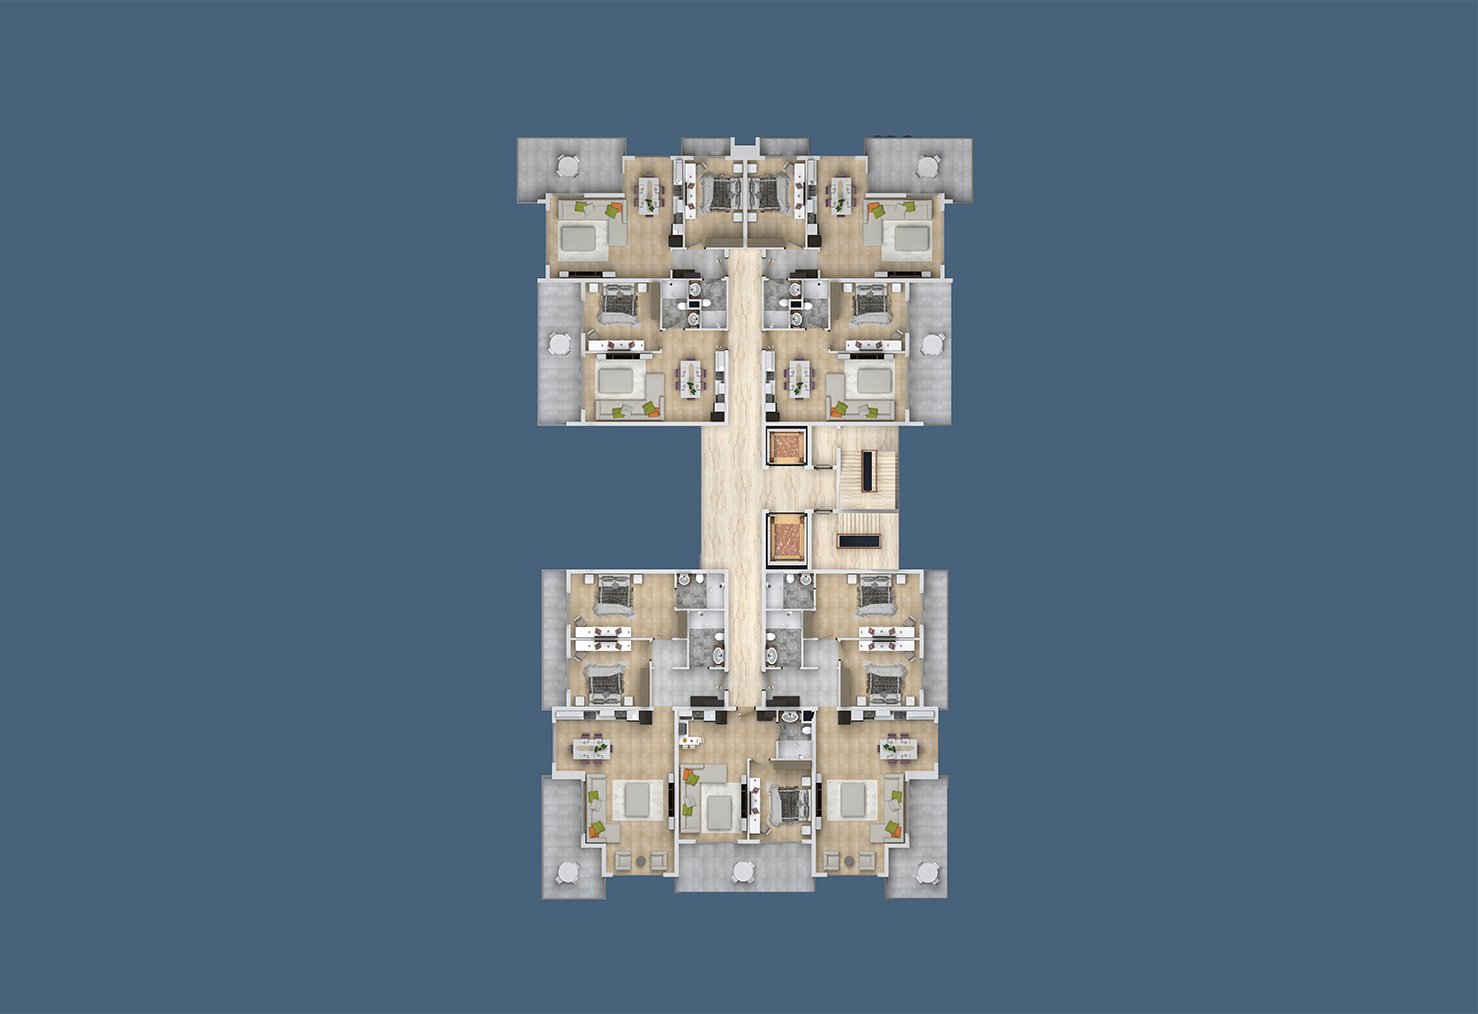 Floor plans of apartments 5 floor «A» Yekta Kingdom Trade Center